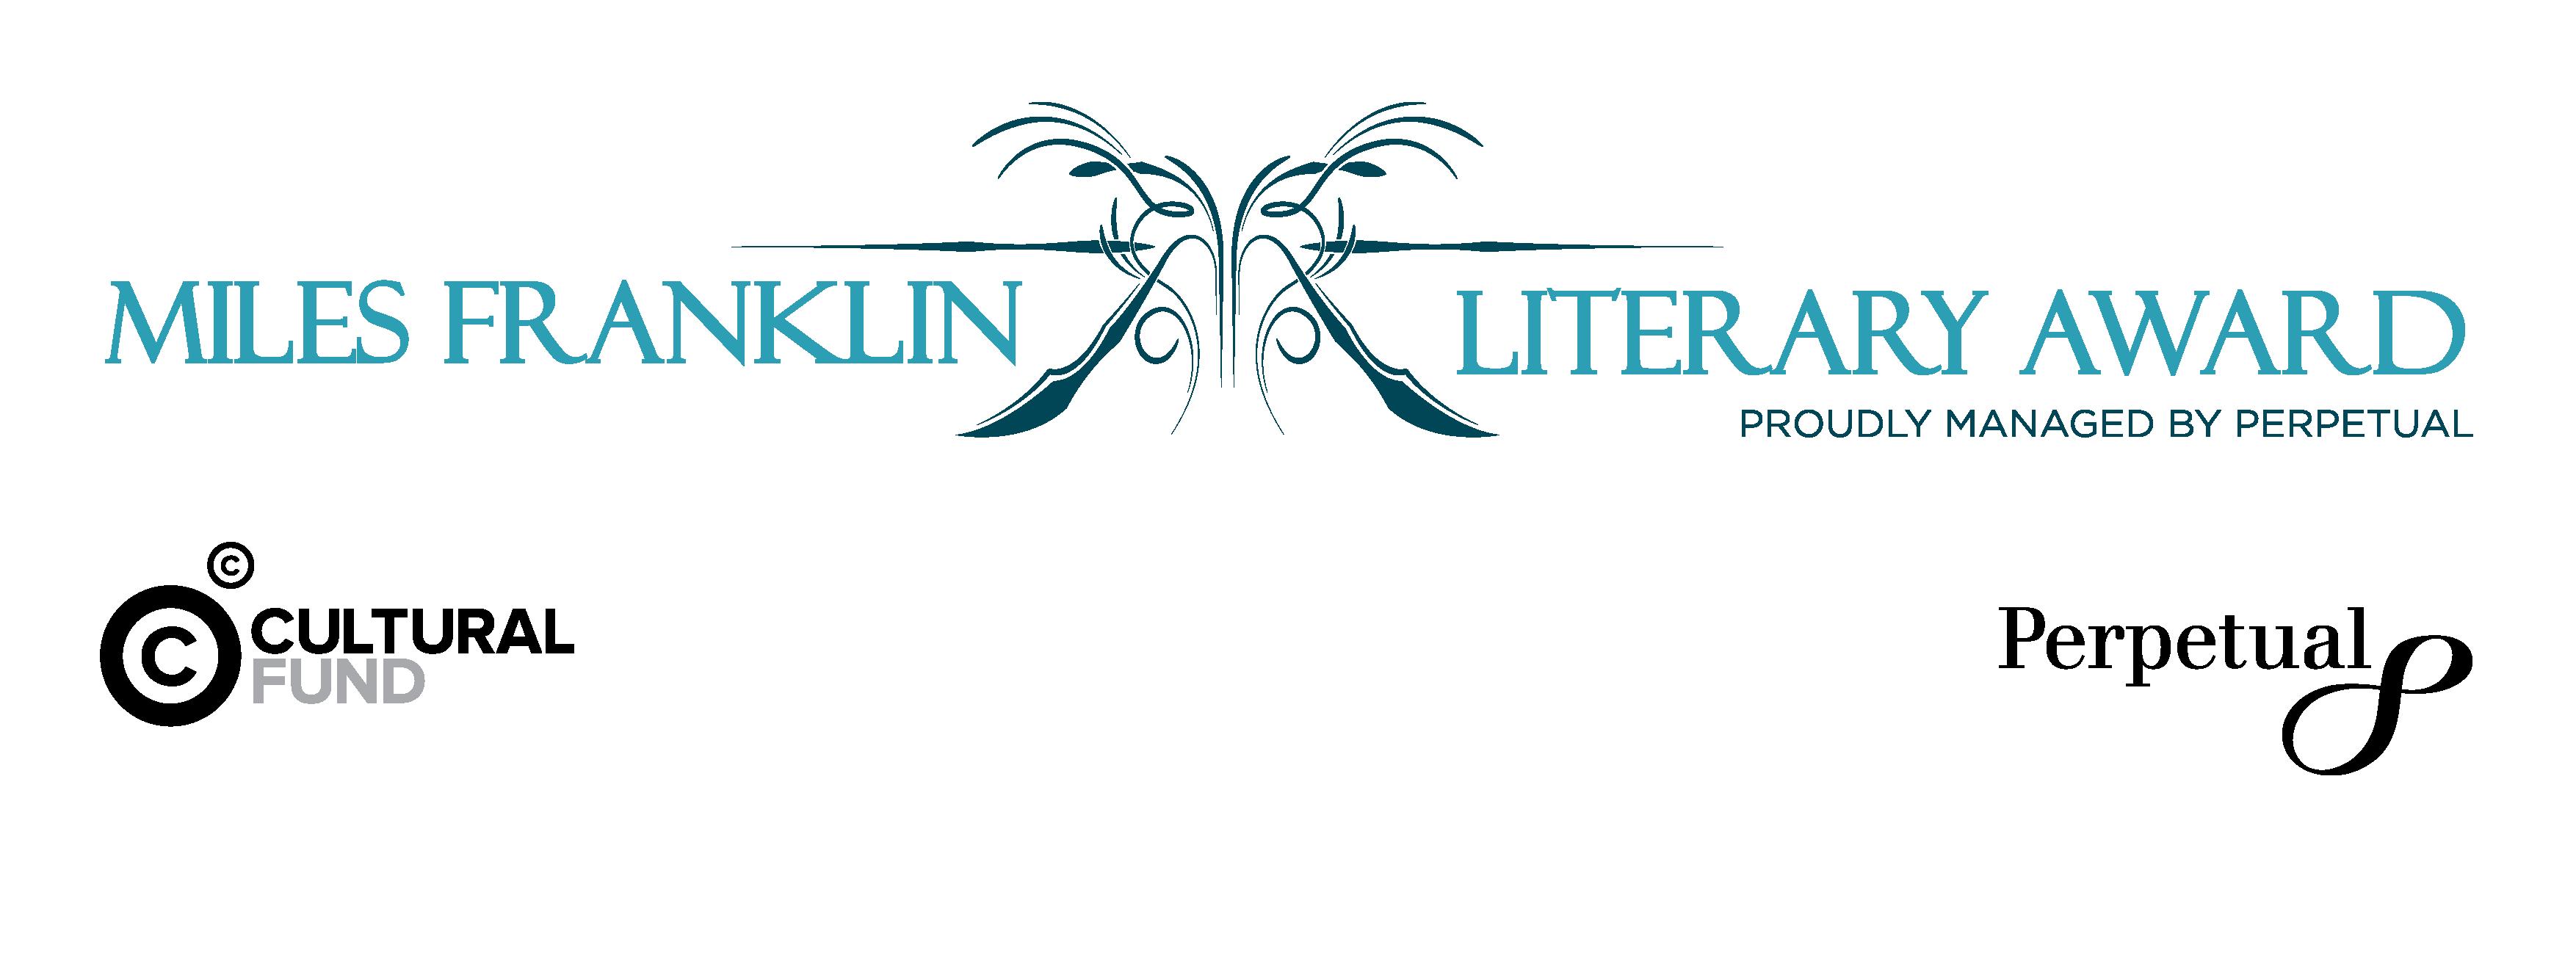 Miles Franklin Literary Award